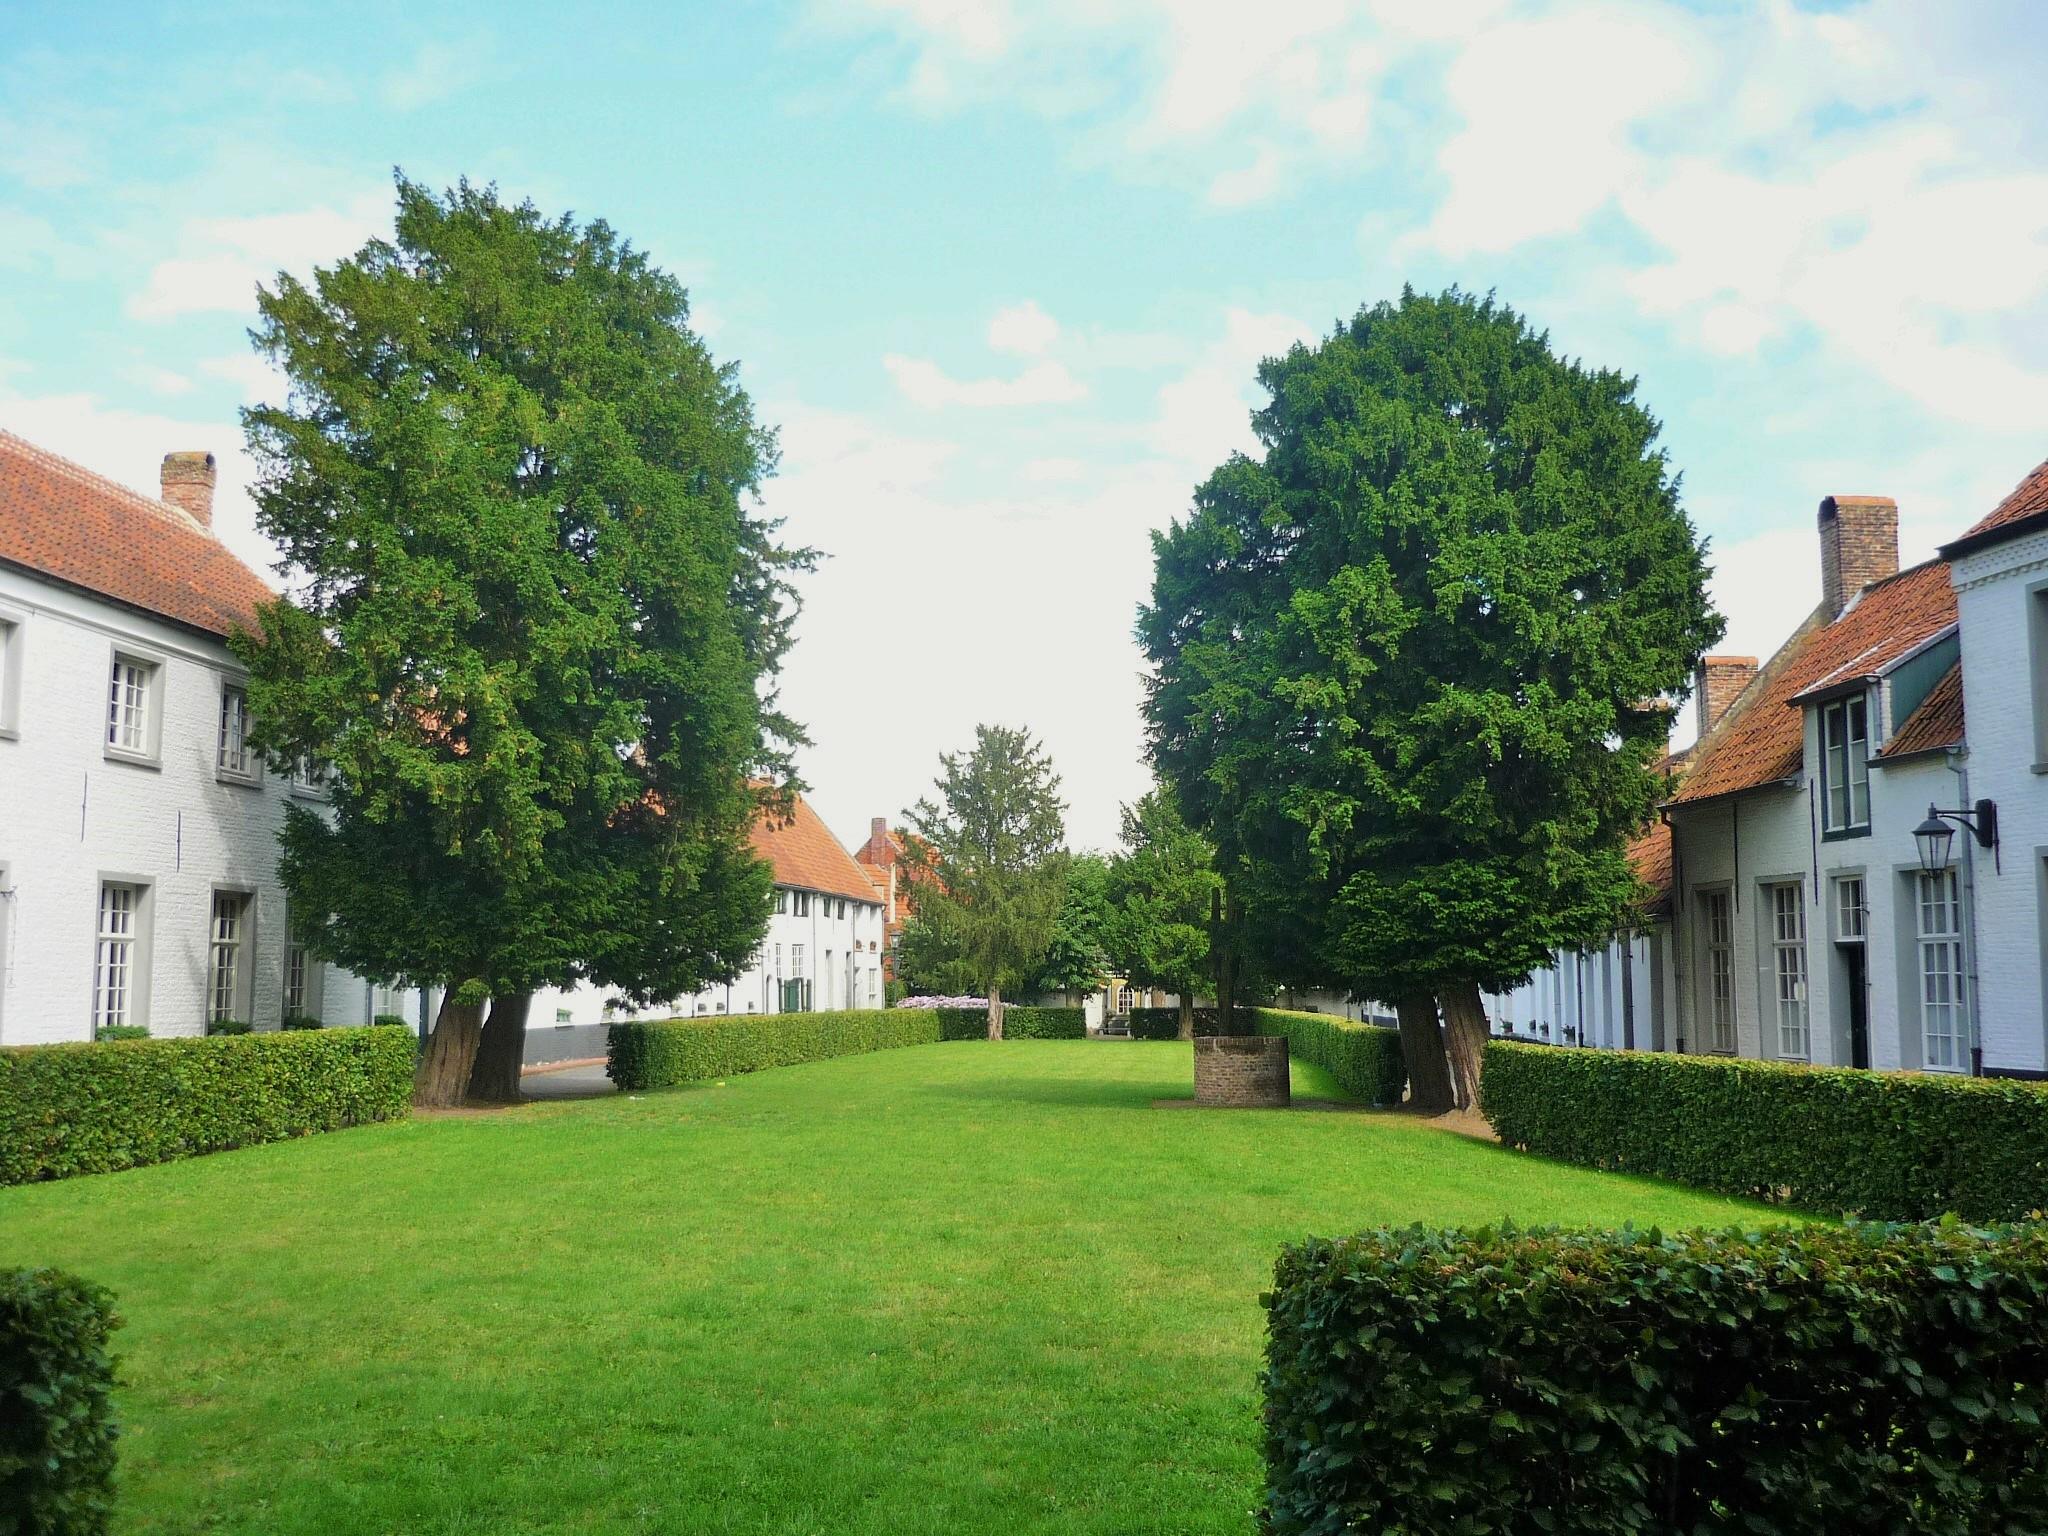 Hoogstraten - egy kis Flandria 013_1.jpg